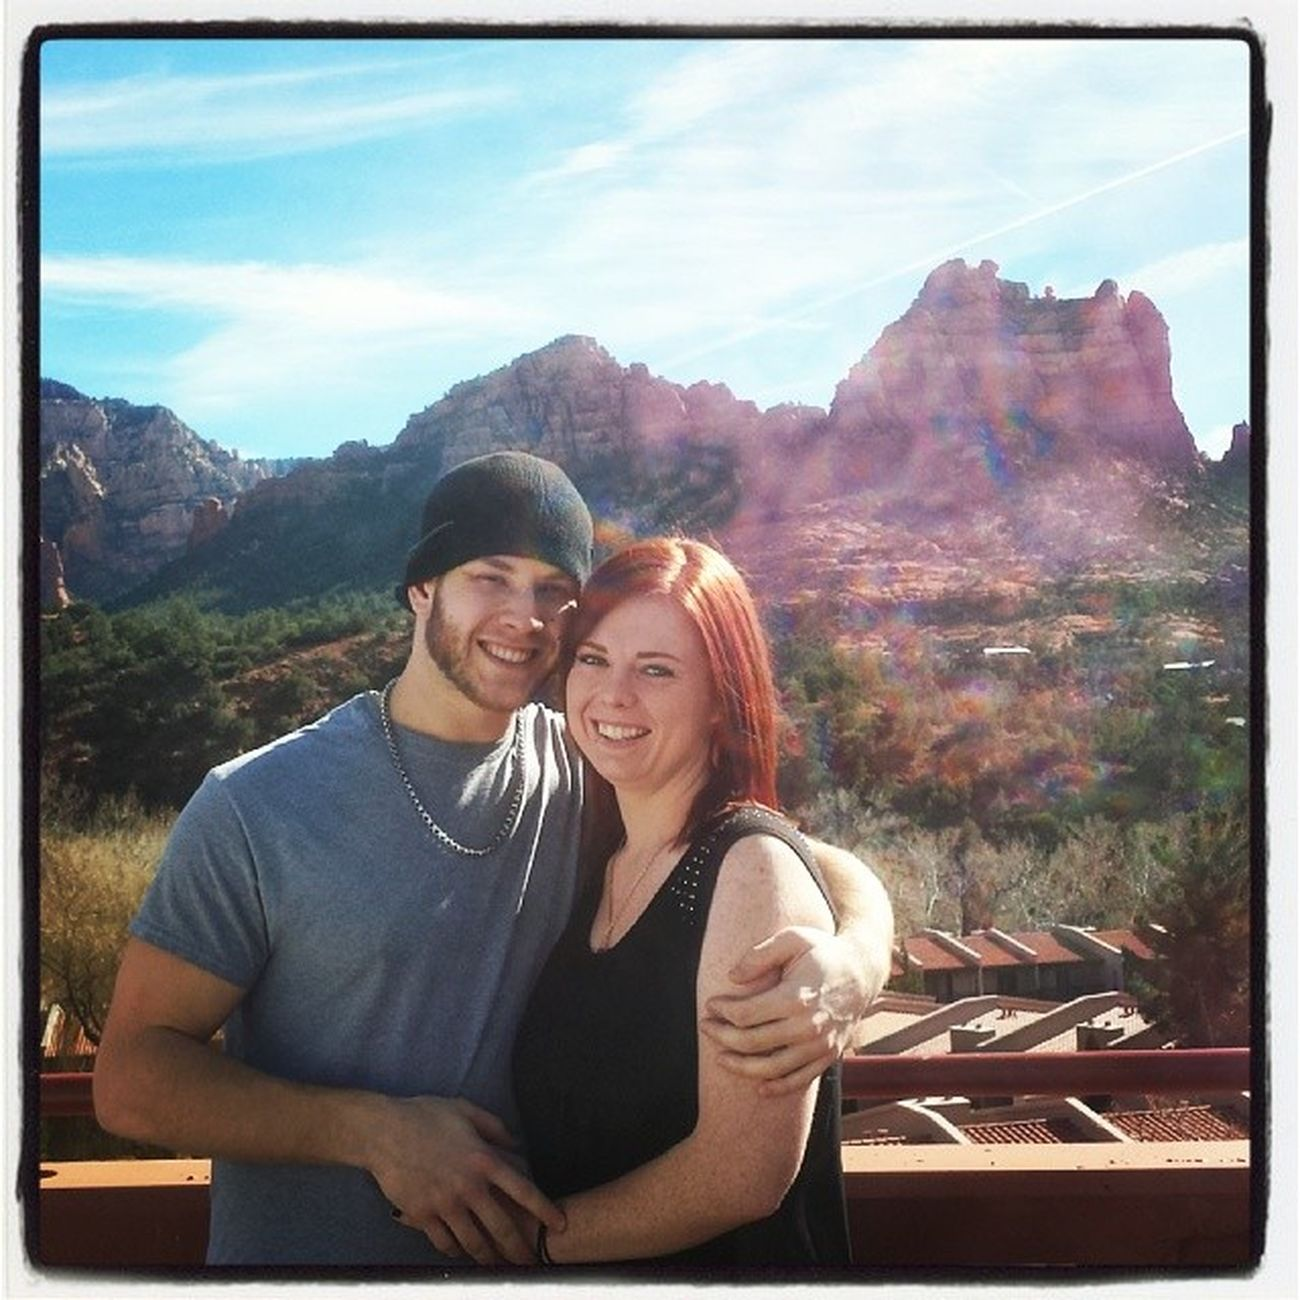 Elizabeth Fisheye Scott Couplesweekend sedona az arizona friends orbs mountains rainboworbs douseethem